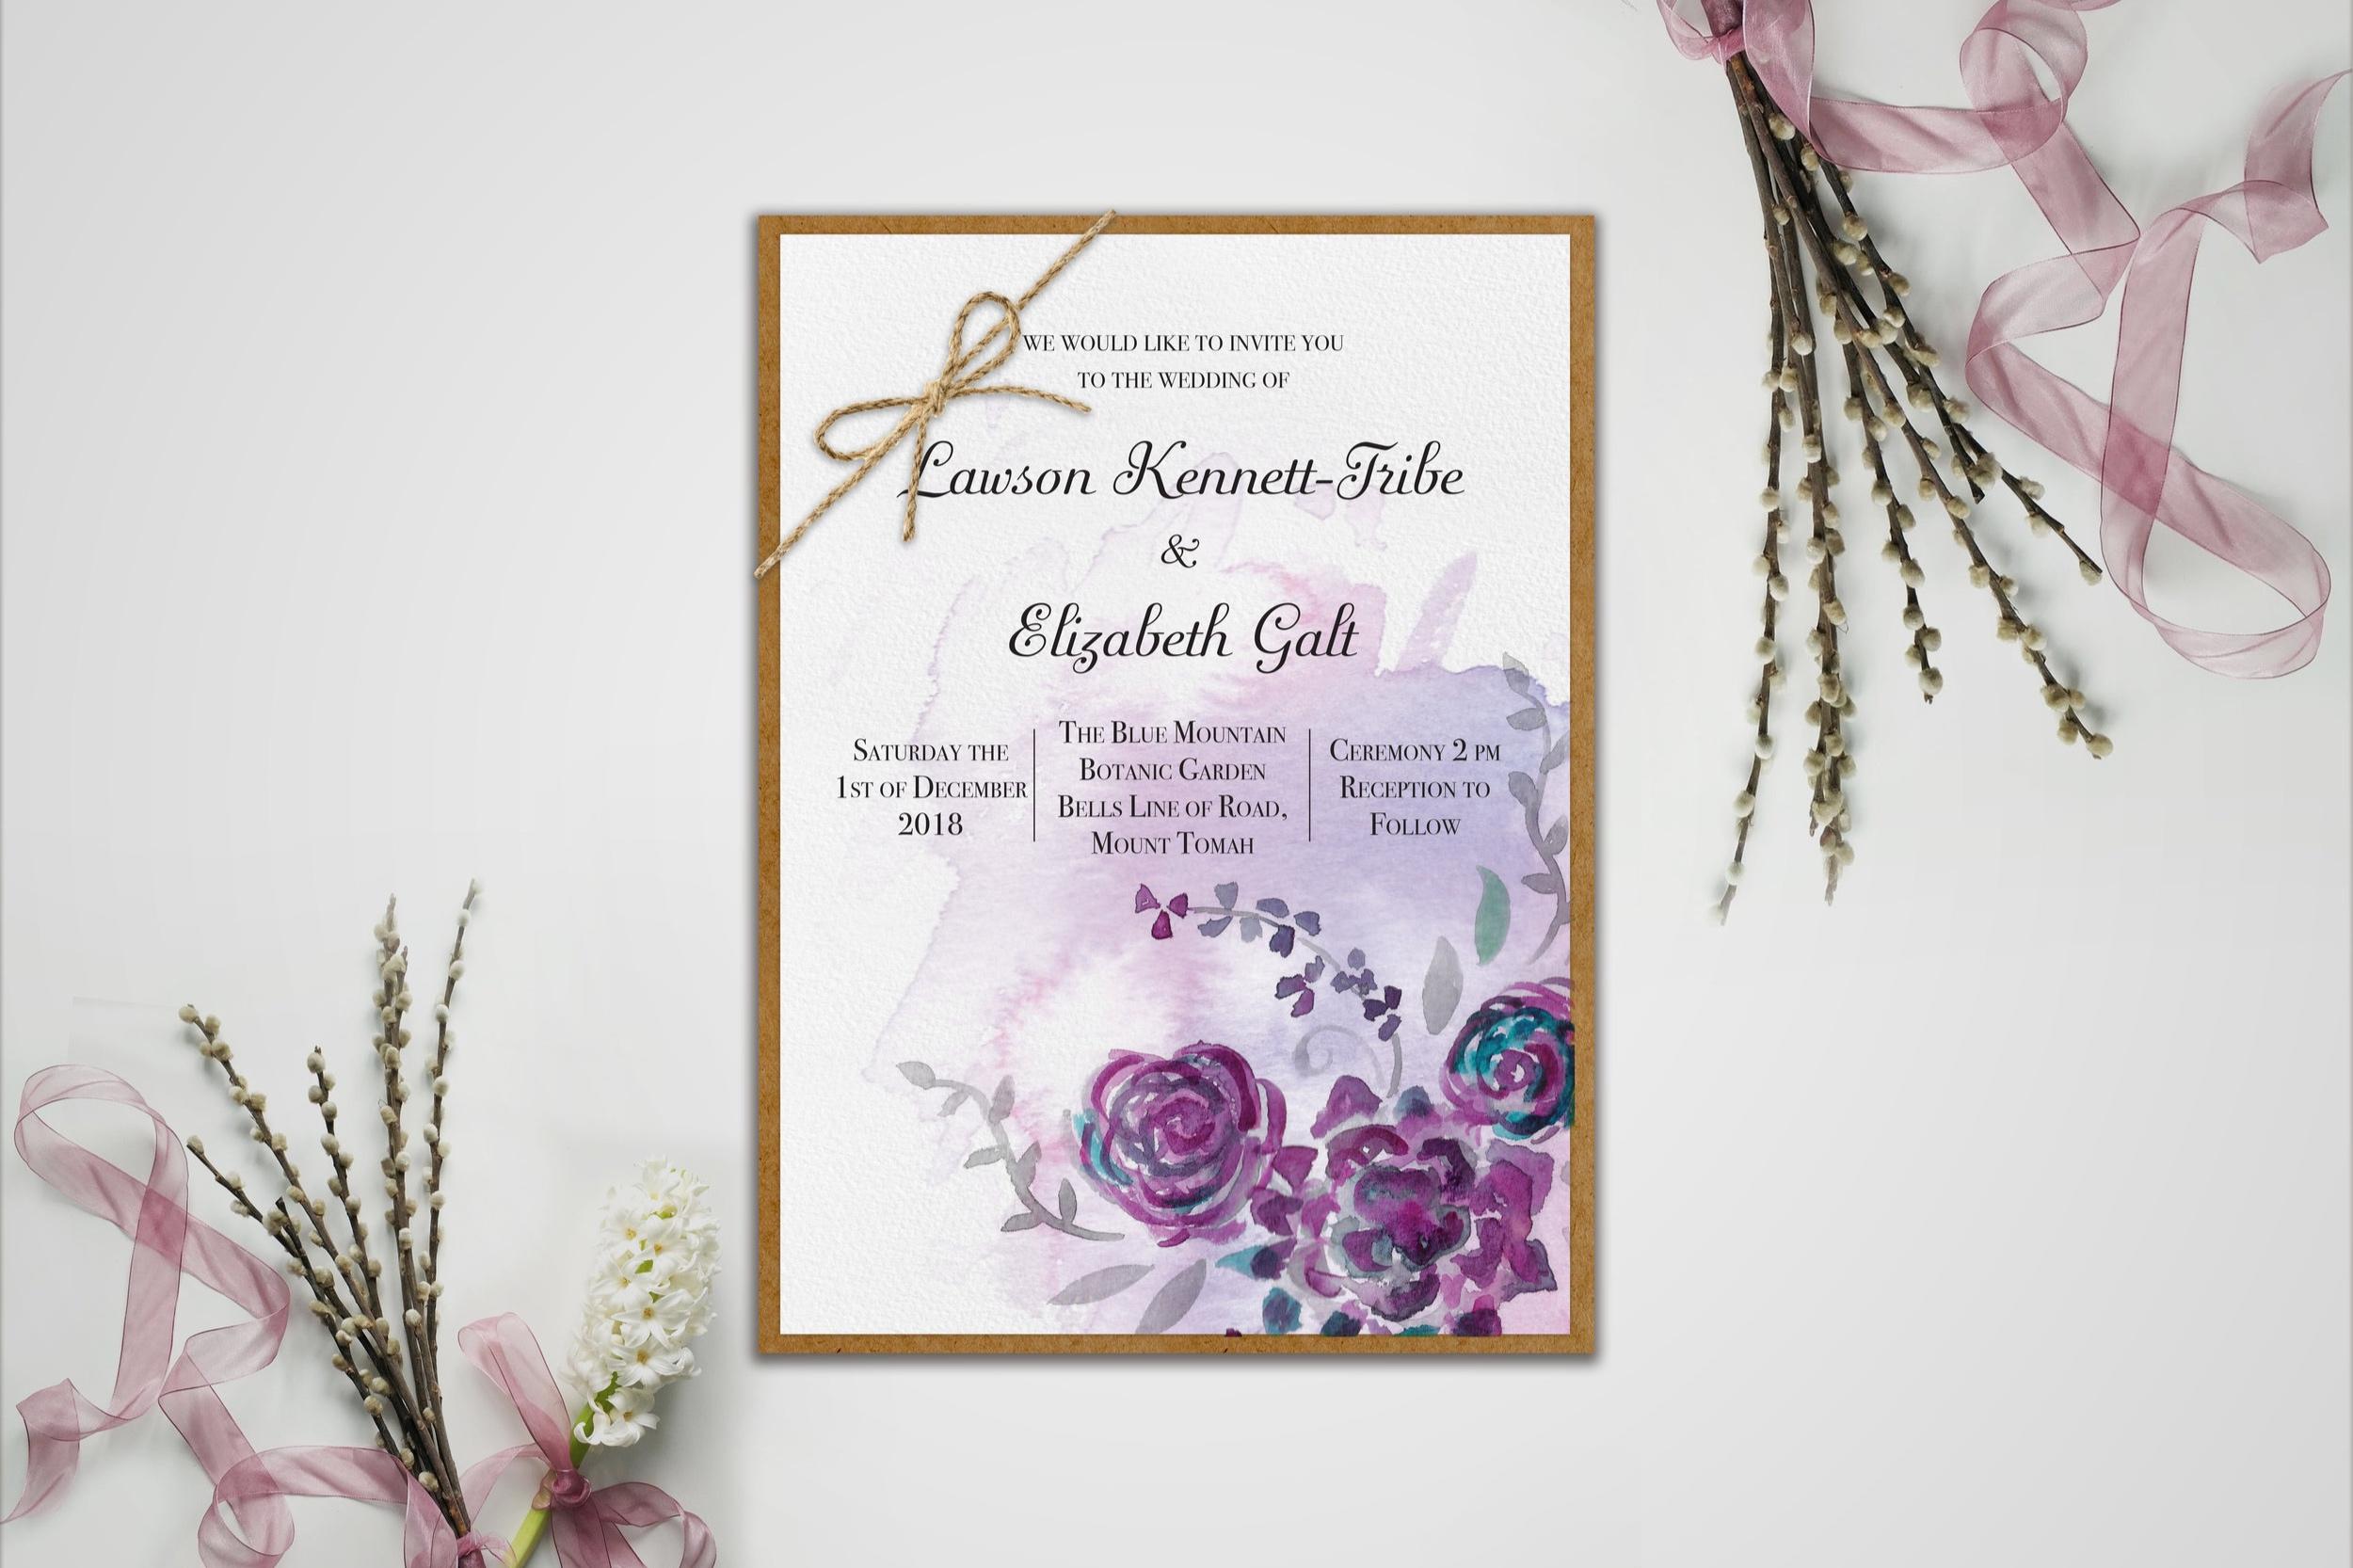 Wedding invite – Lawson and Elizabeth